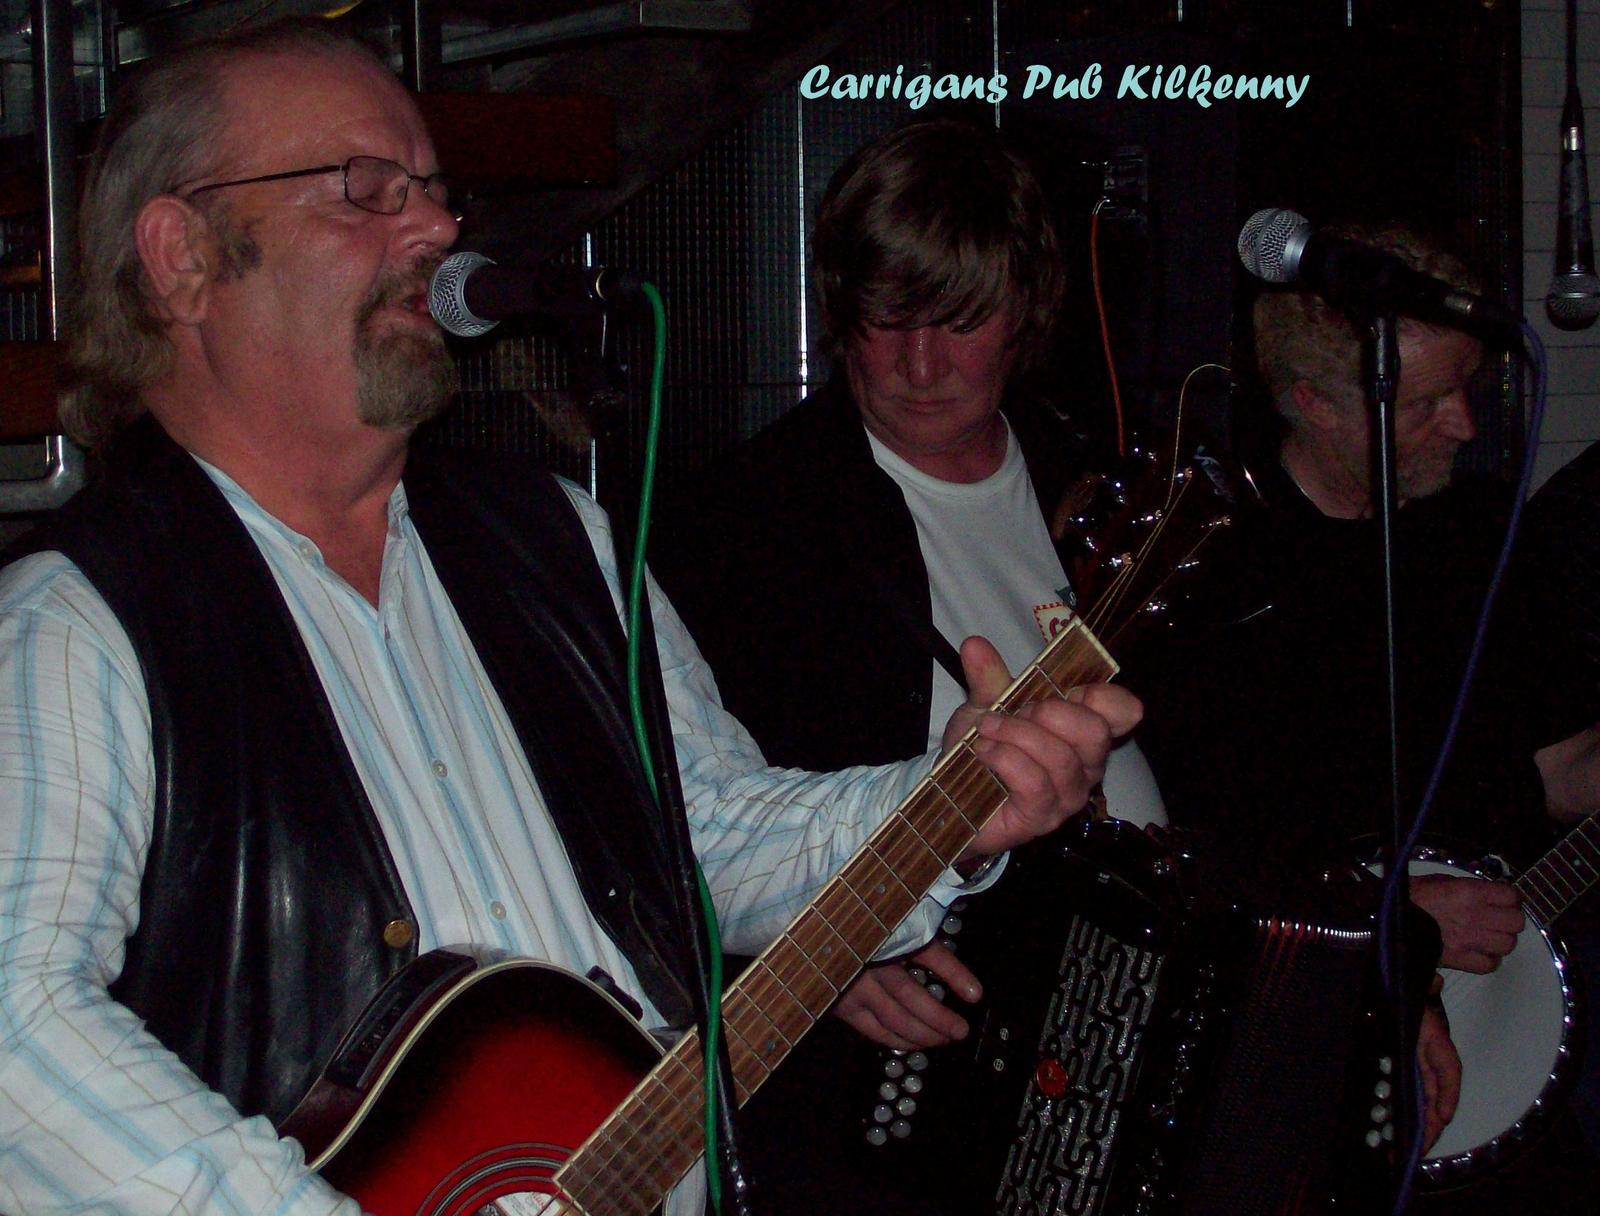 Carrigans`s Pub Kilkenny